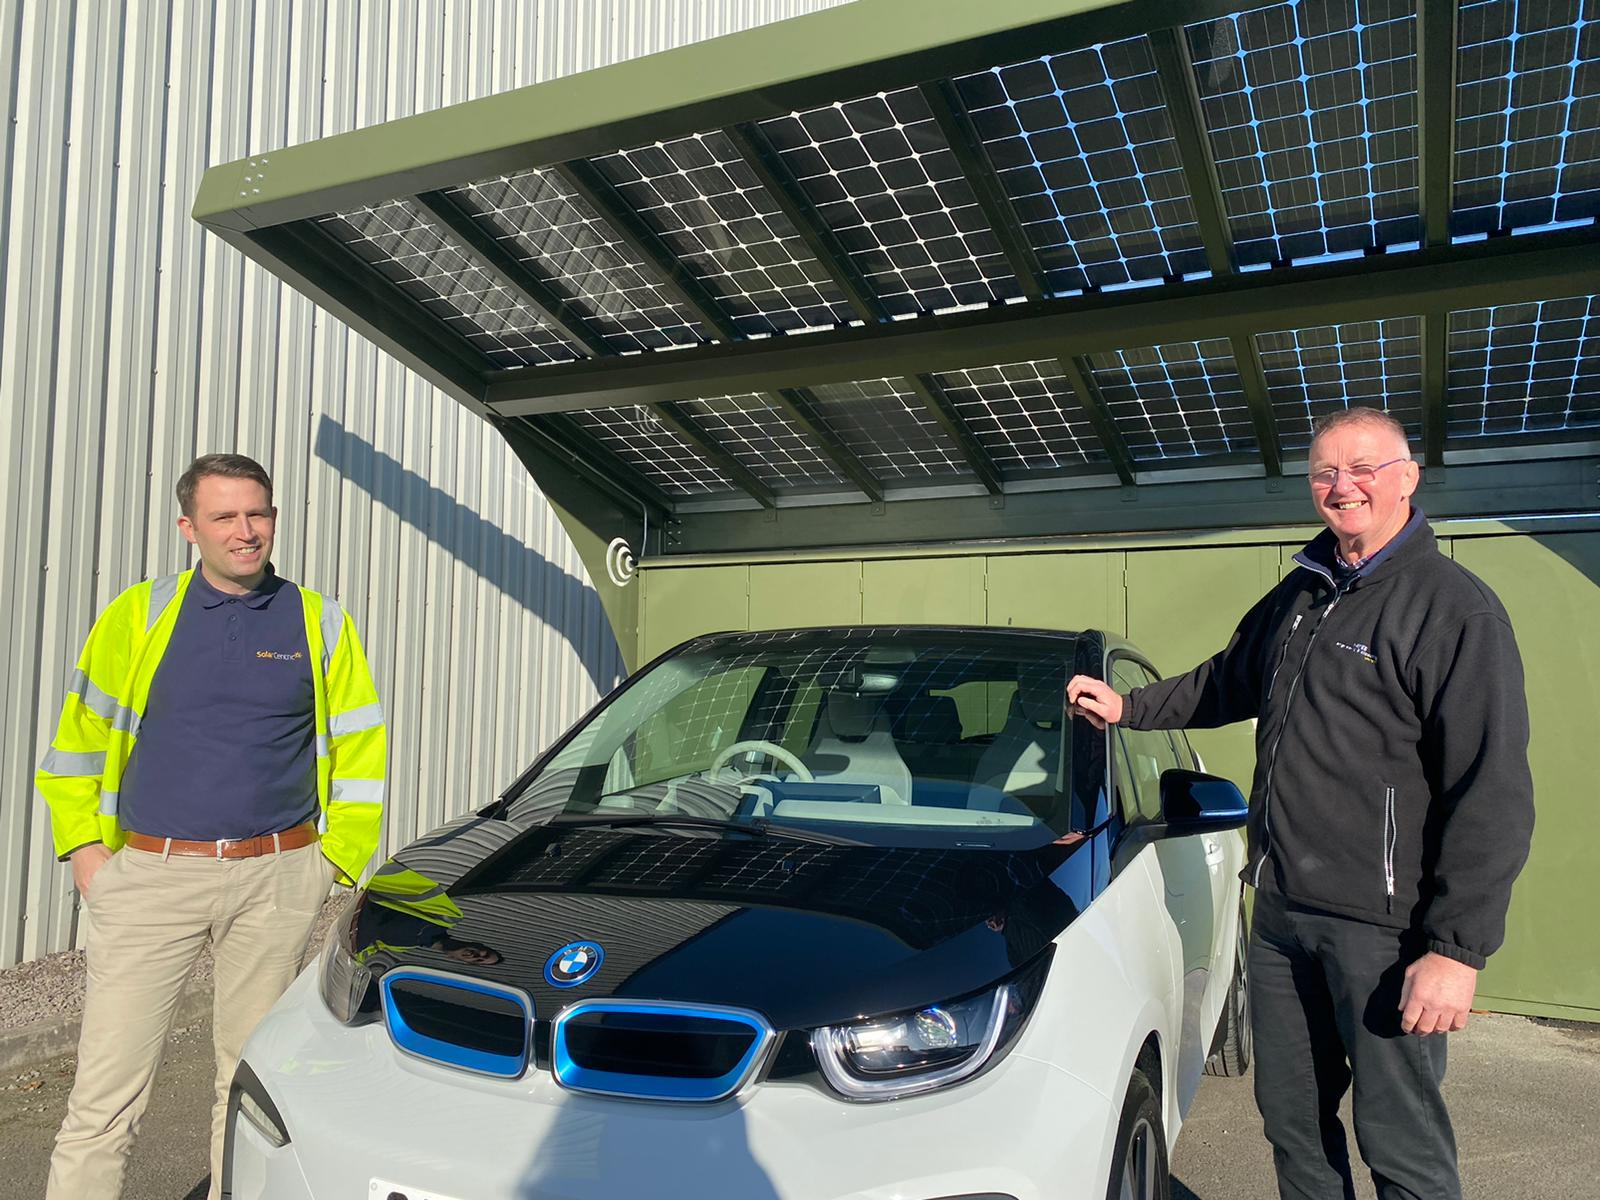 Launch of Centregreat PowerPort – Solar Powered EV Carport